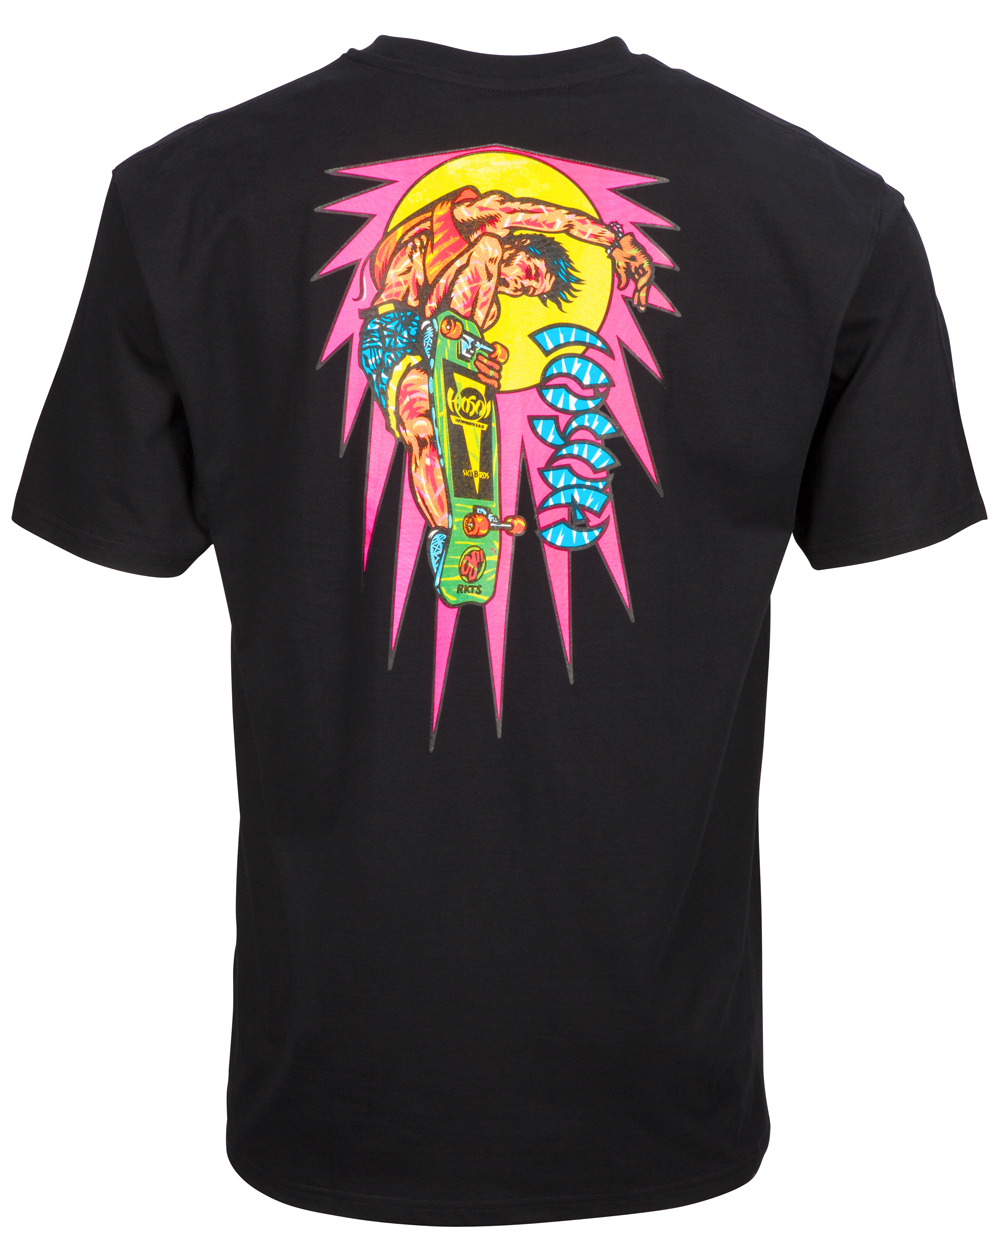 Santa Cruz OGSC Hosoi Rocket Air T-Shirt Uomo Black